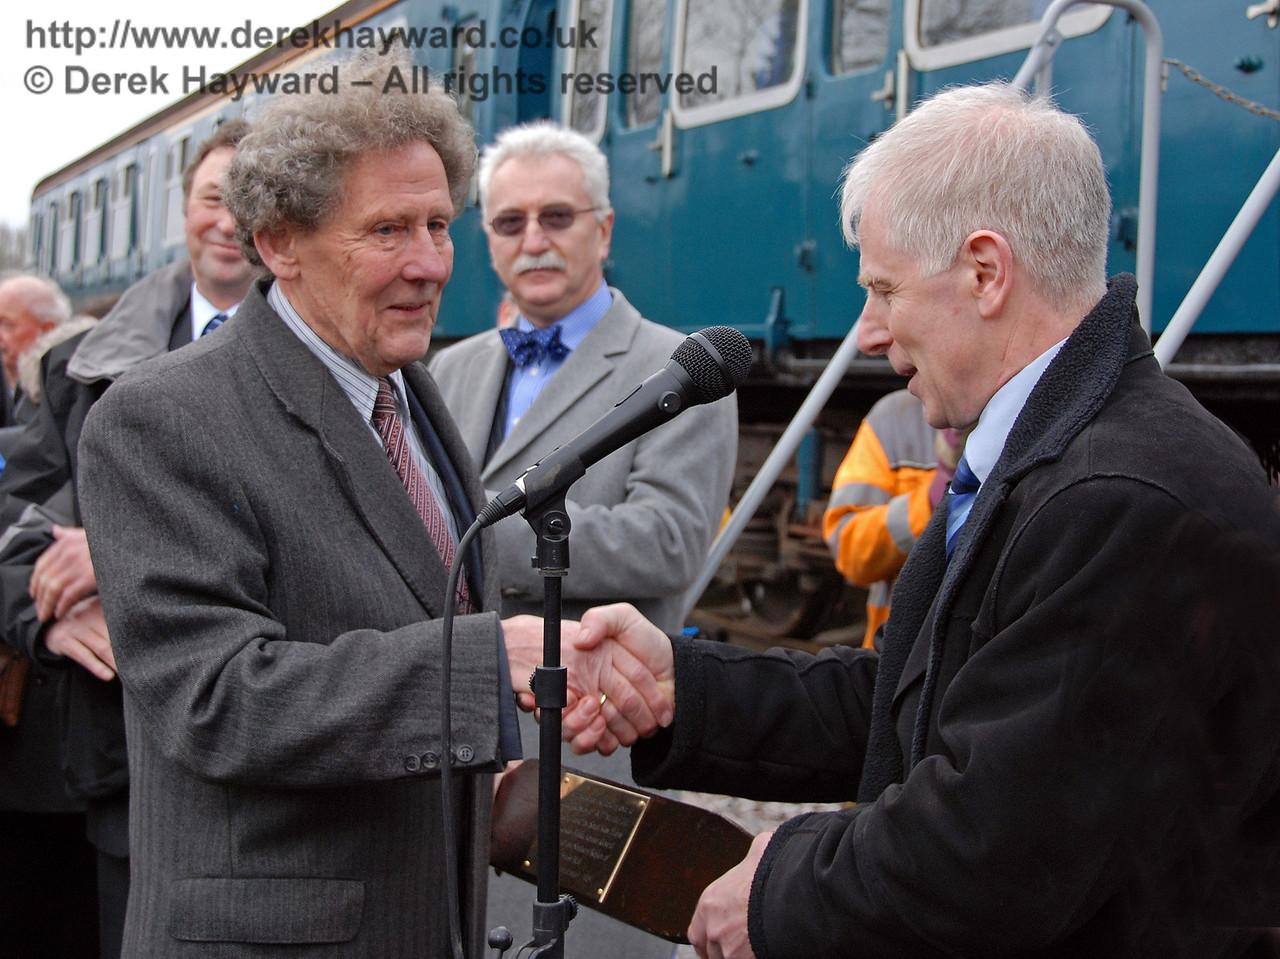 Roy Watts, Chairman, BRPS, makes a presentation to Gordon Pettitt. East Grinstead 17.01.2009  108